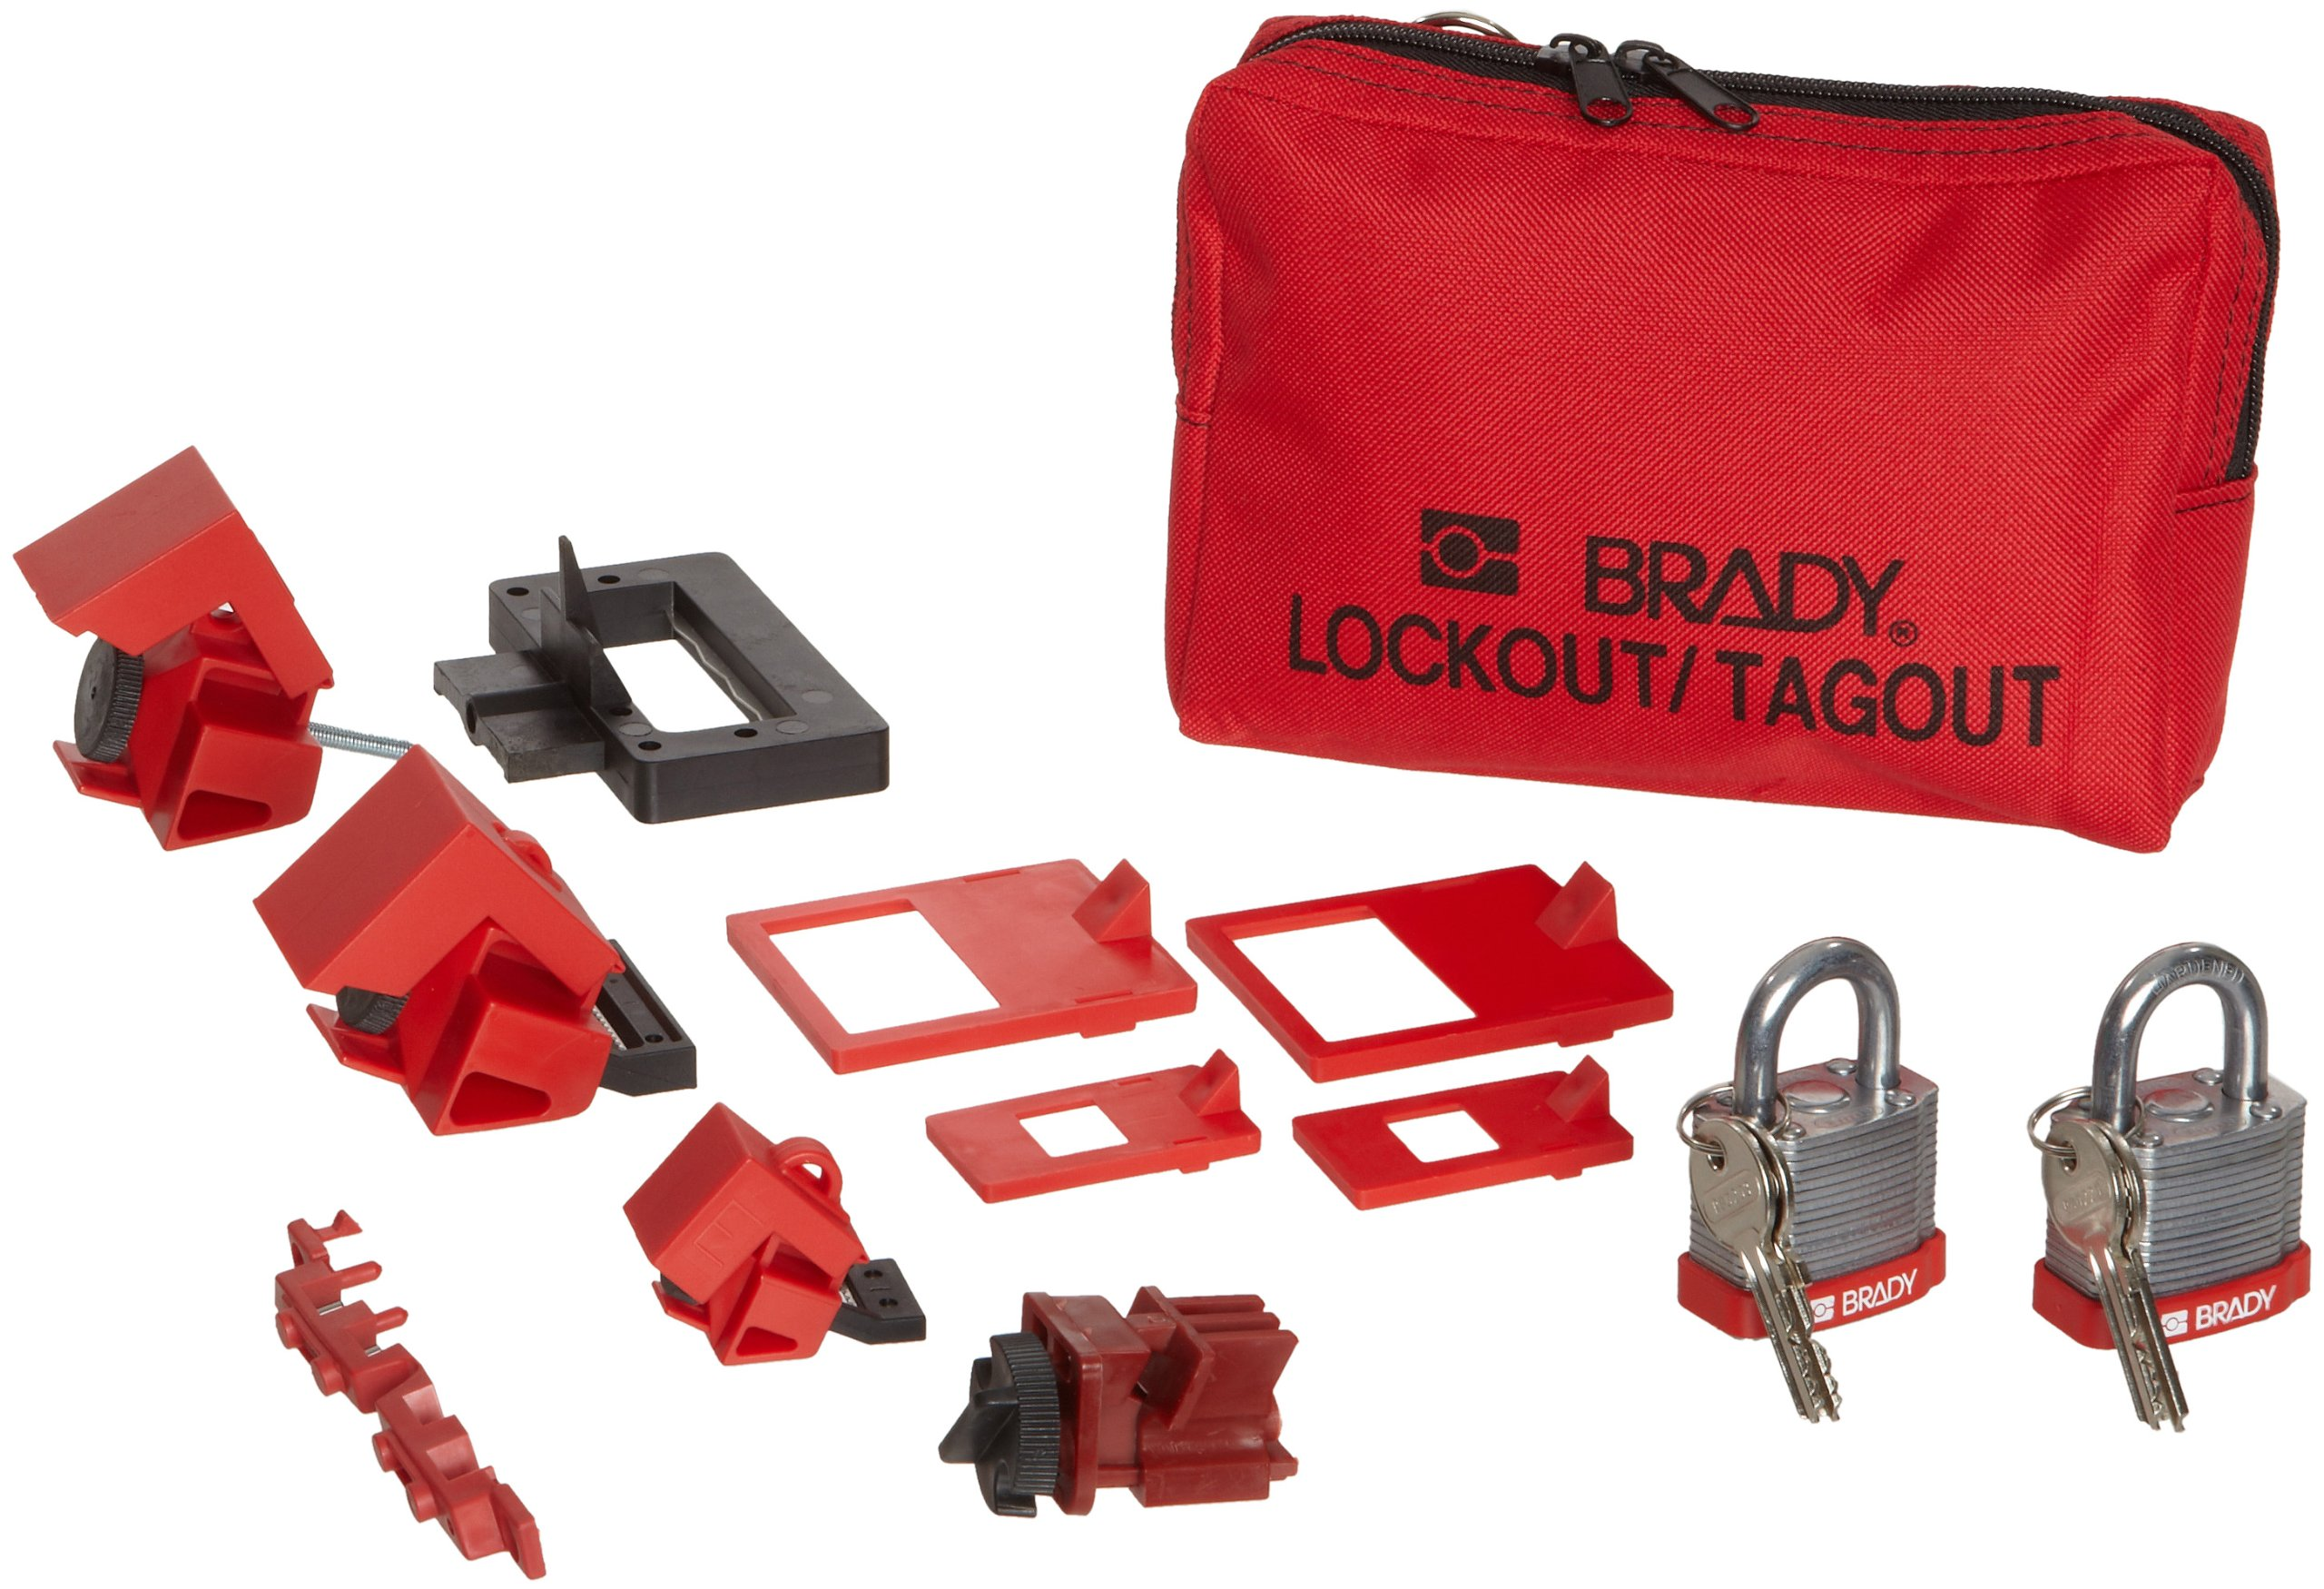 Brady Breaker Lockout Pouch Kit, Includes 2 Steel Padlocks and 2 Tags